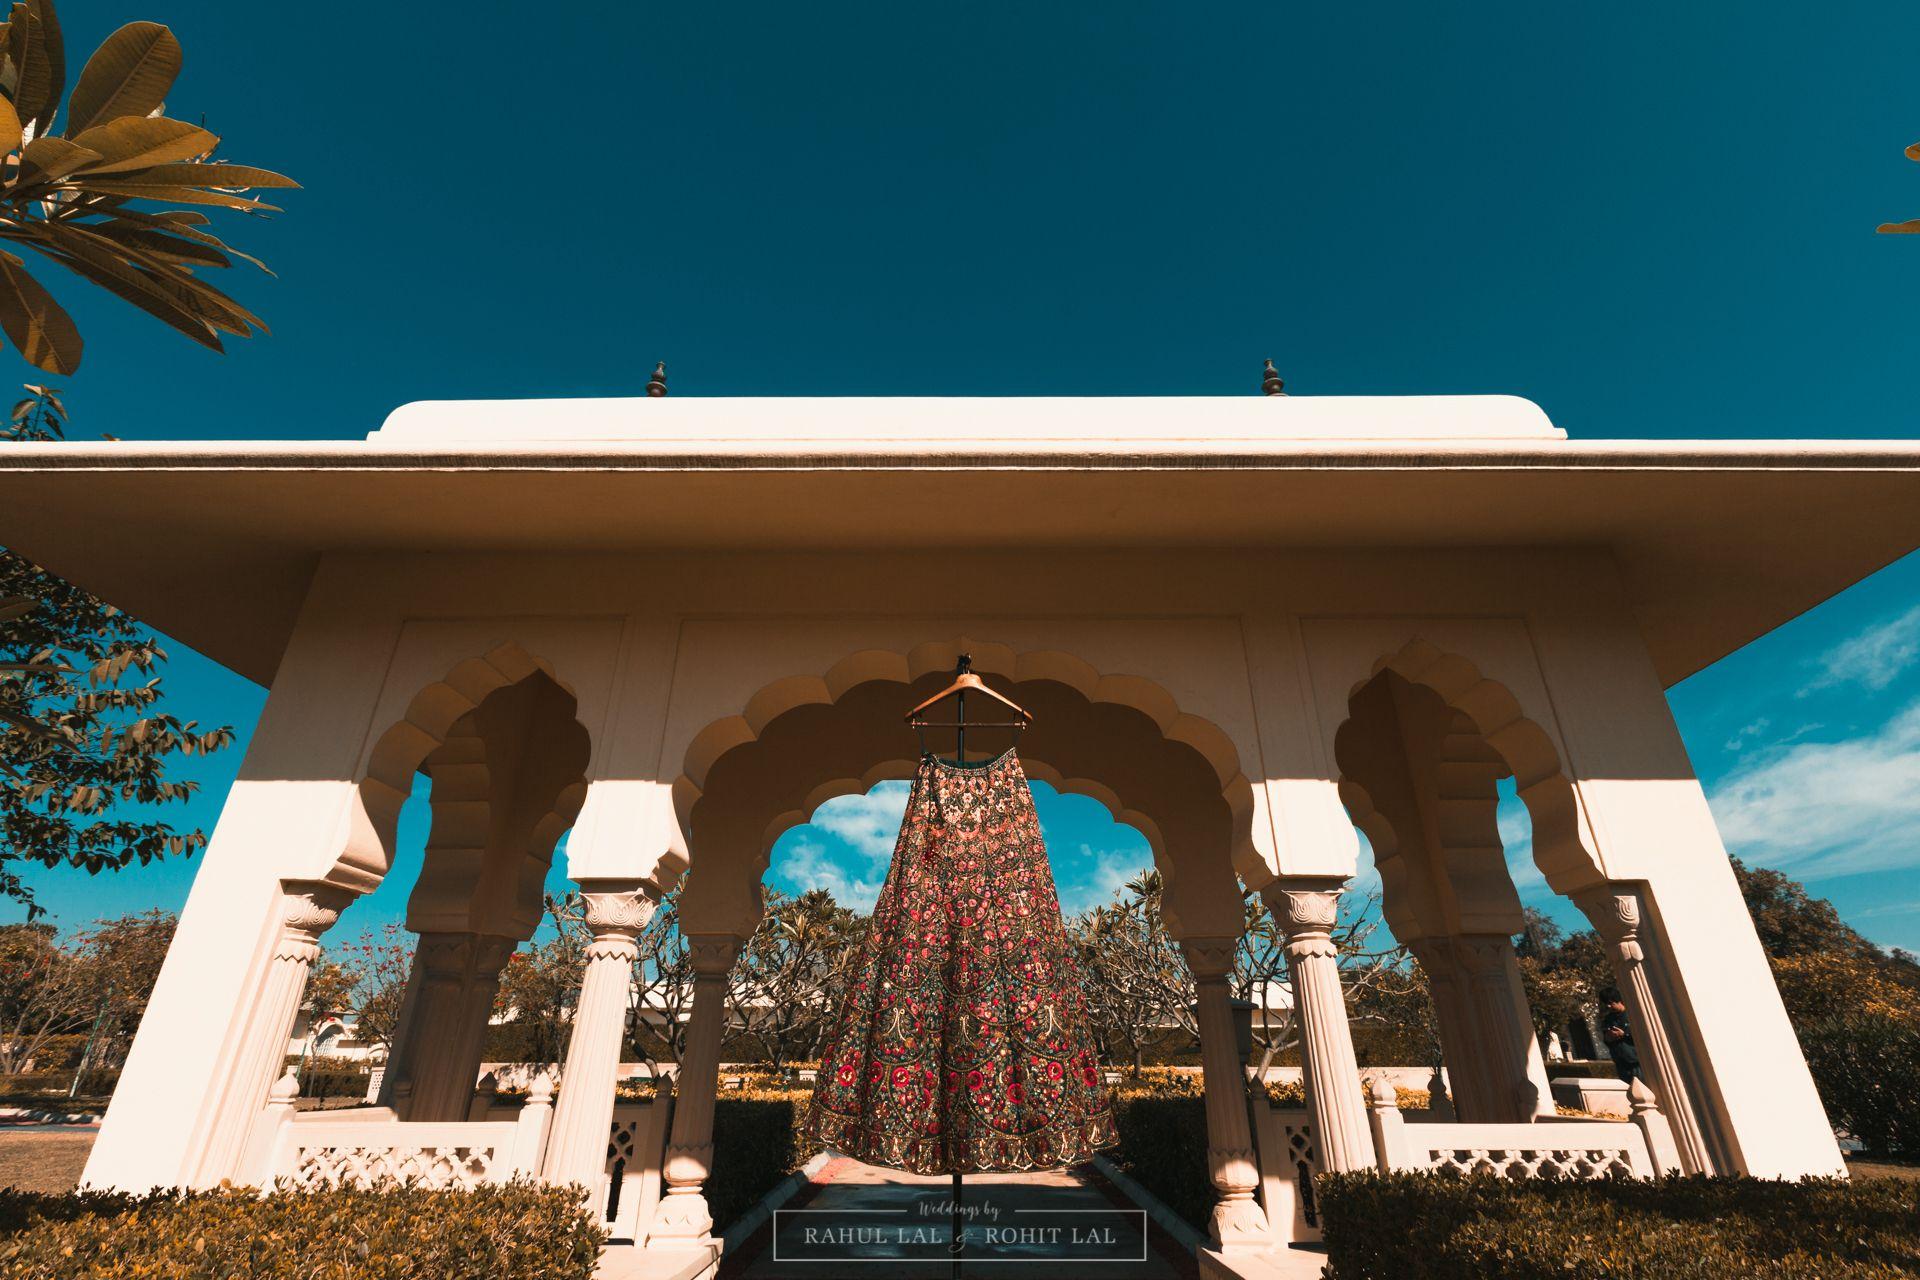 Raisa Vipul Chandigarh Weddings By Rahul Lal Rohit Lal Online Photo Photo Explore